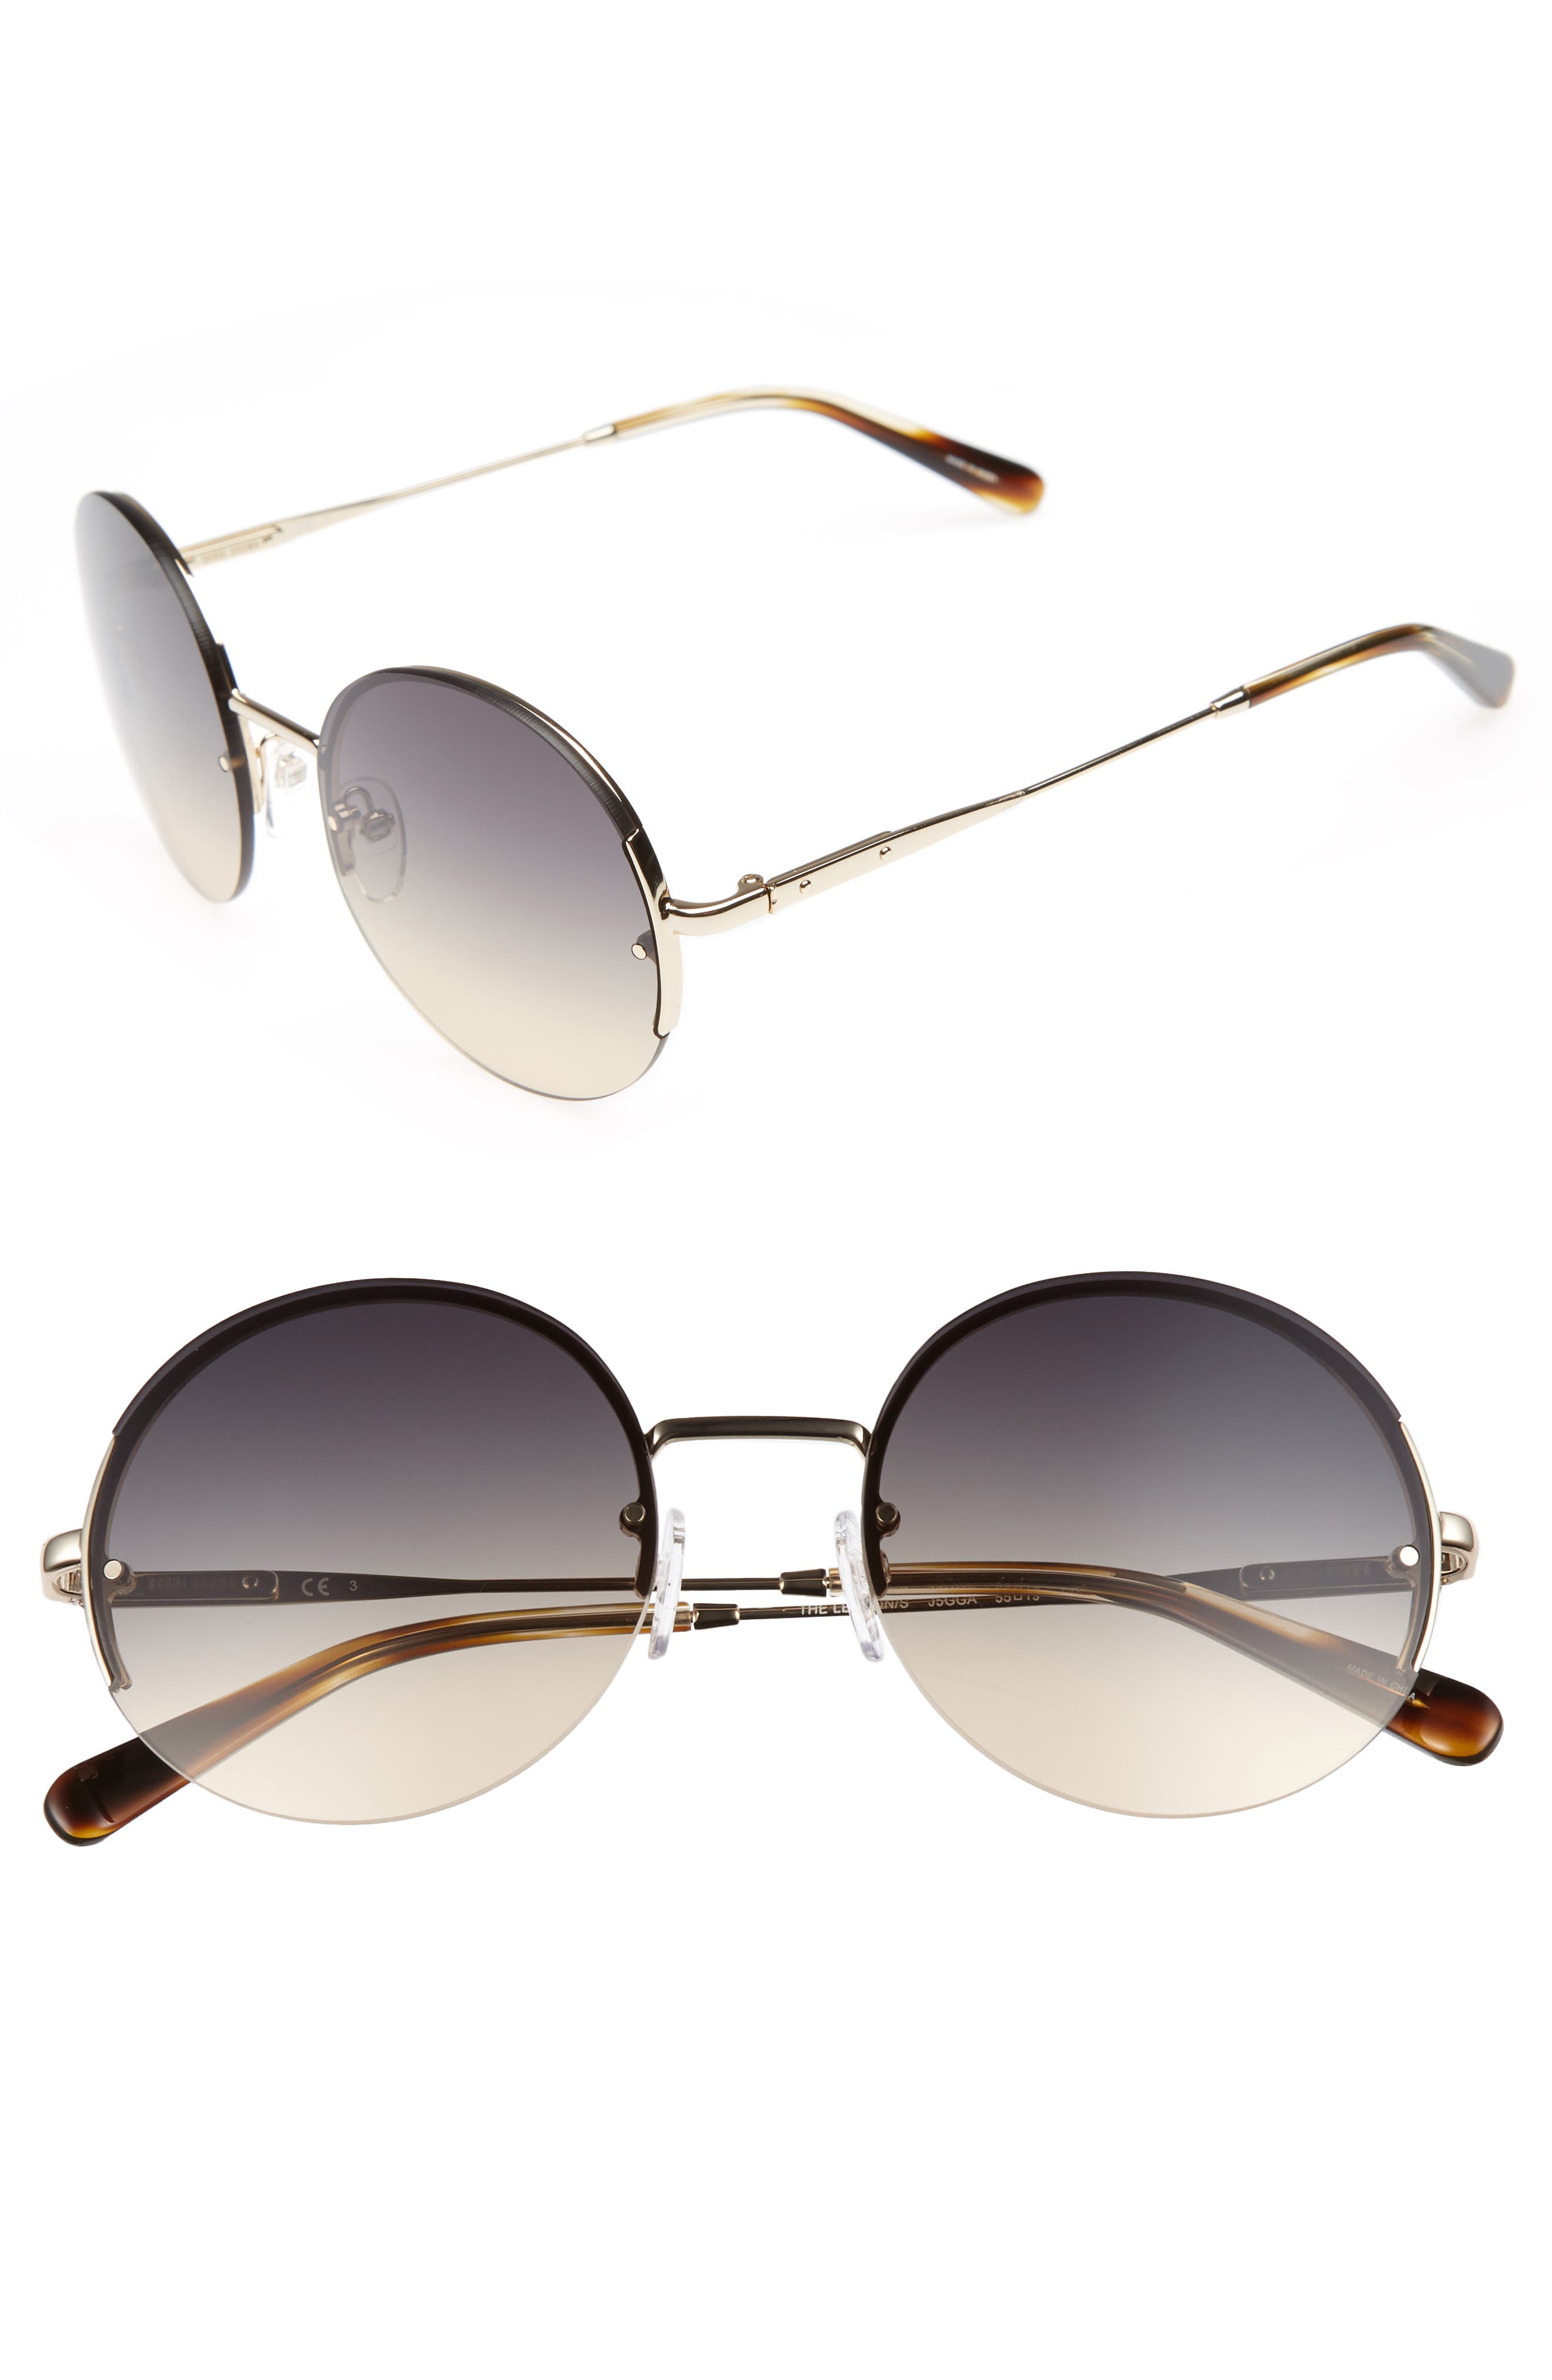 55mm Round Sunglasses,                         Main,                         color, Endura Gold